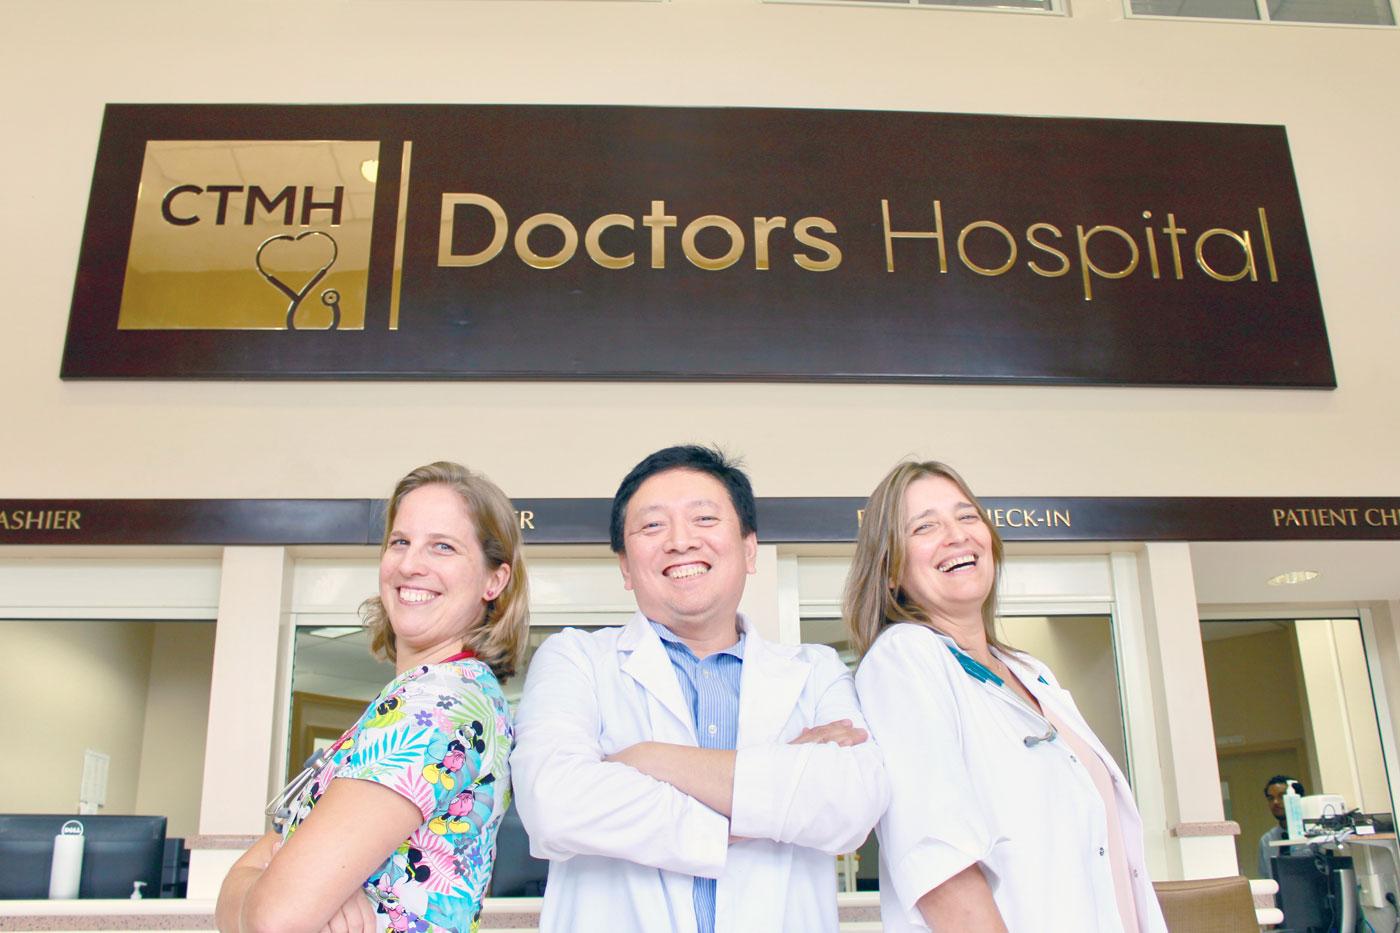 CTMH Doctors Hospital